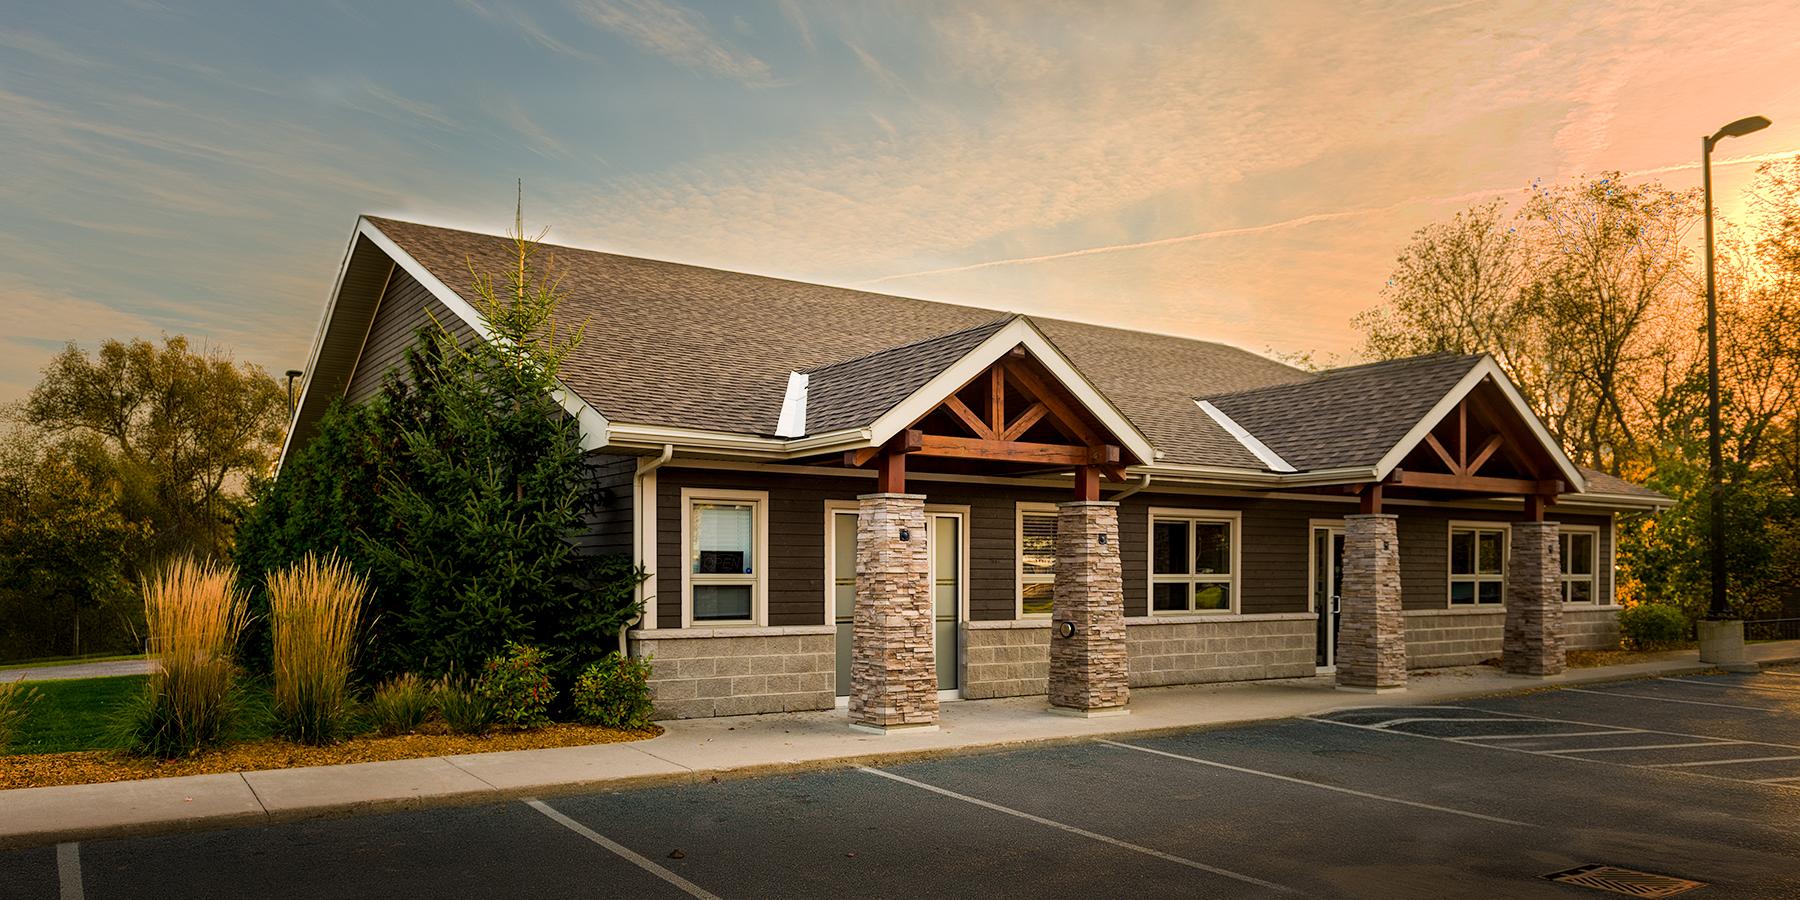 Kingston Foot Clinic Building